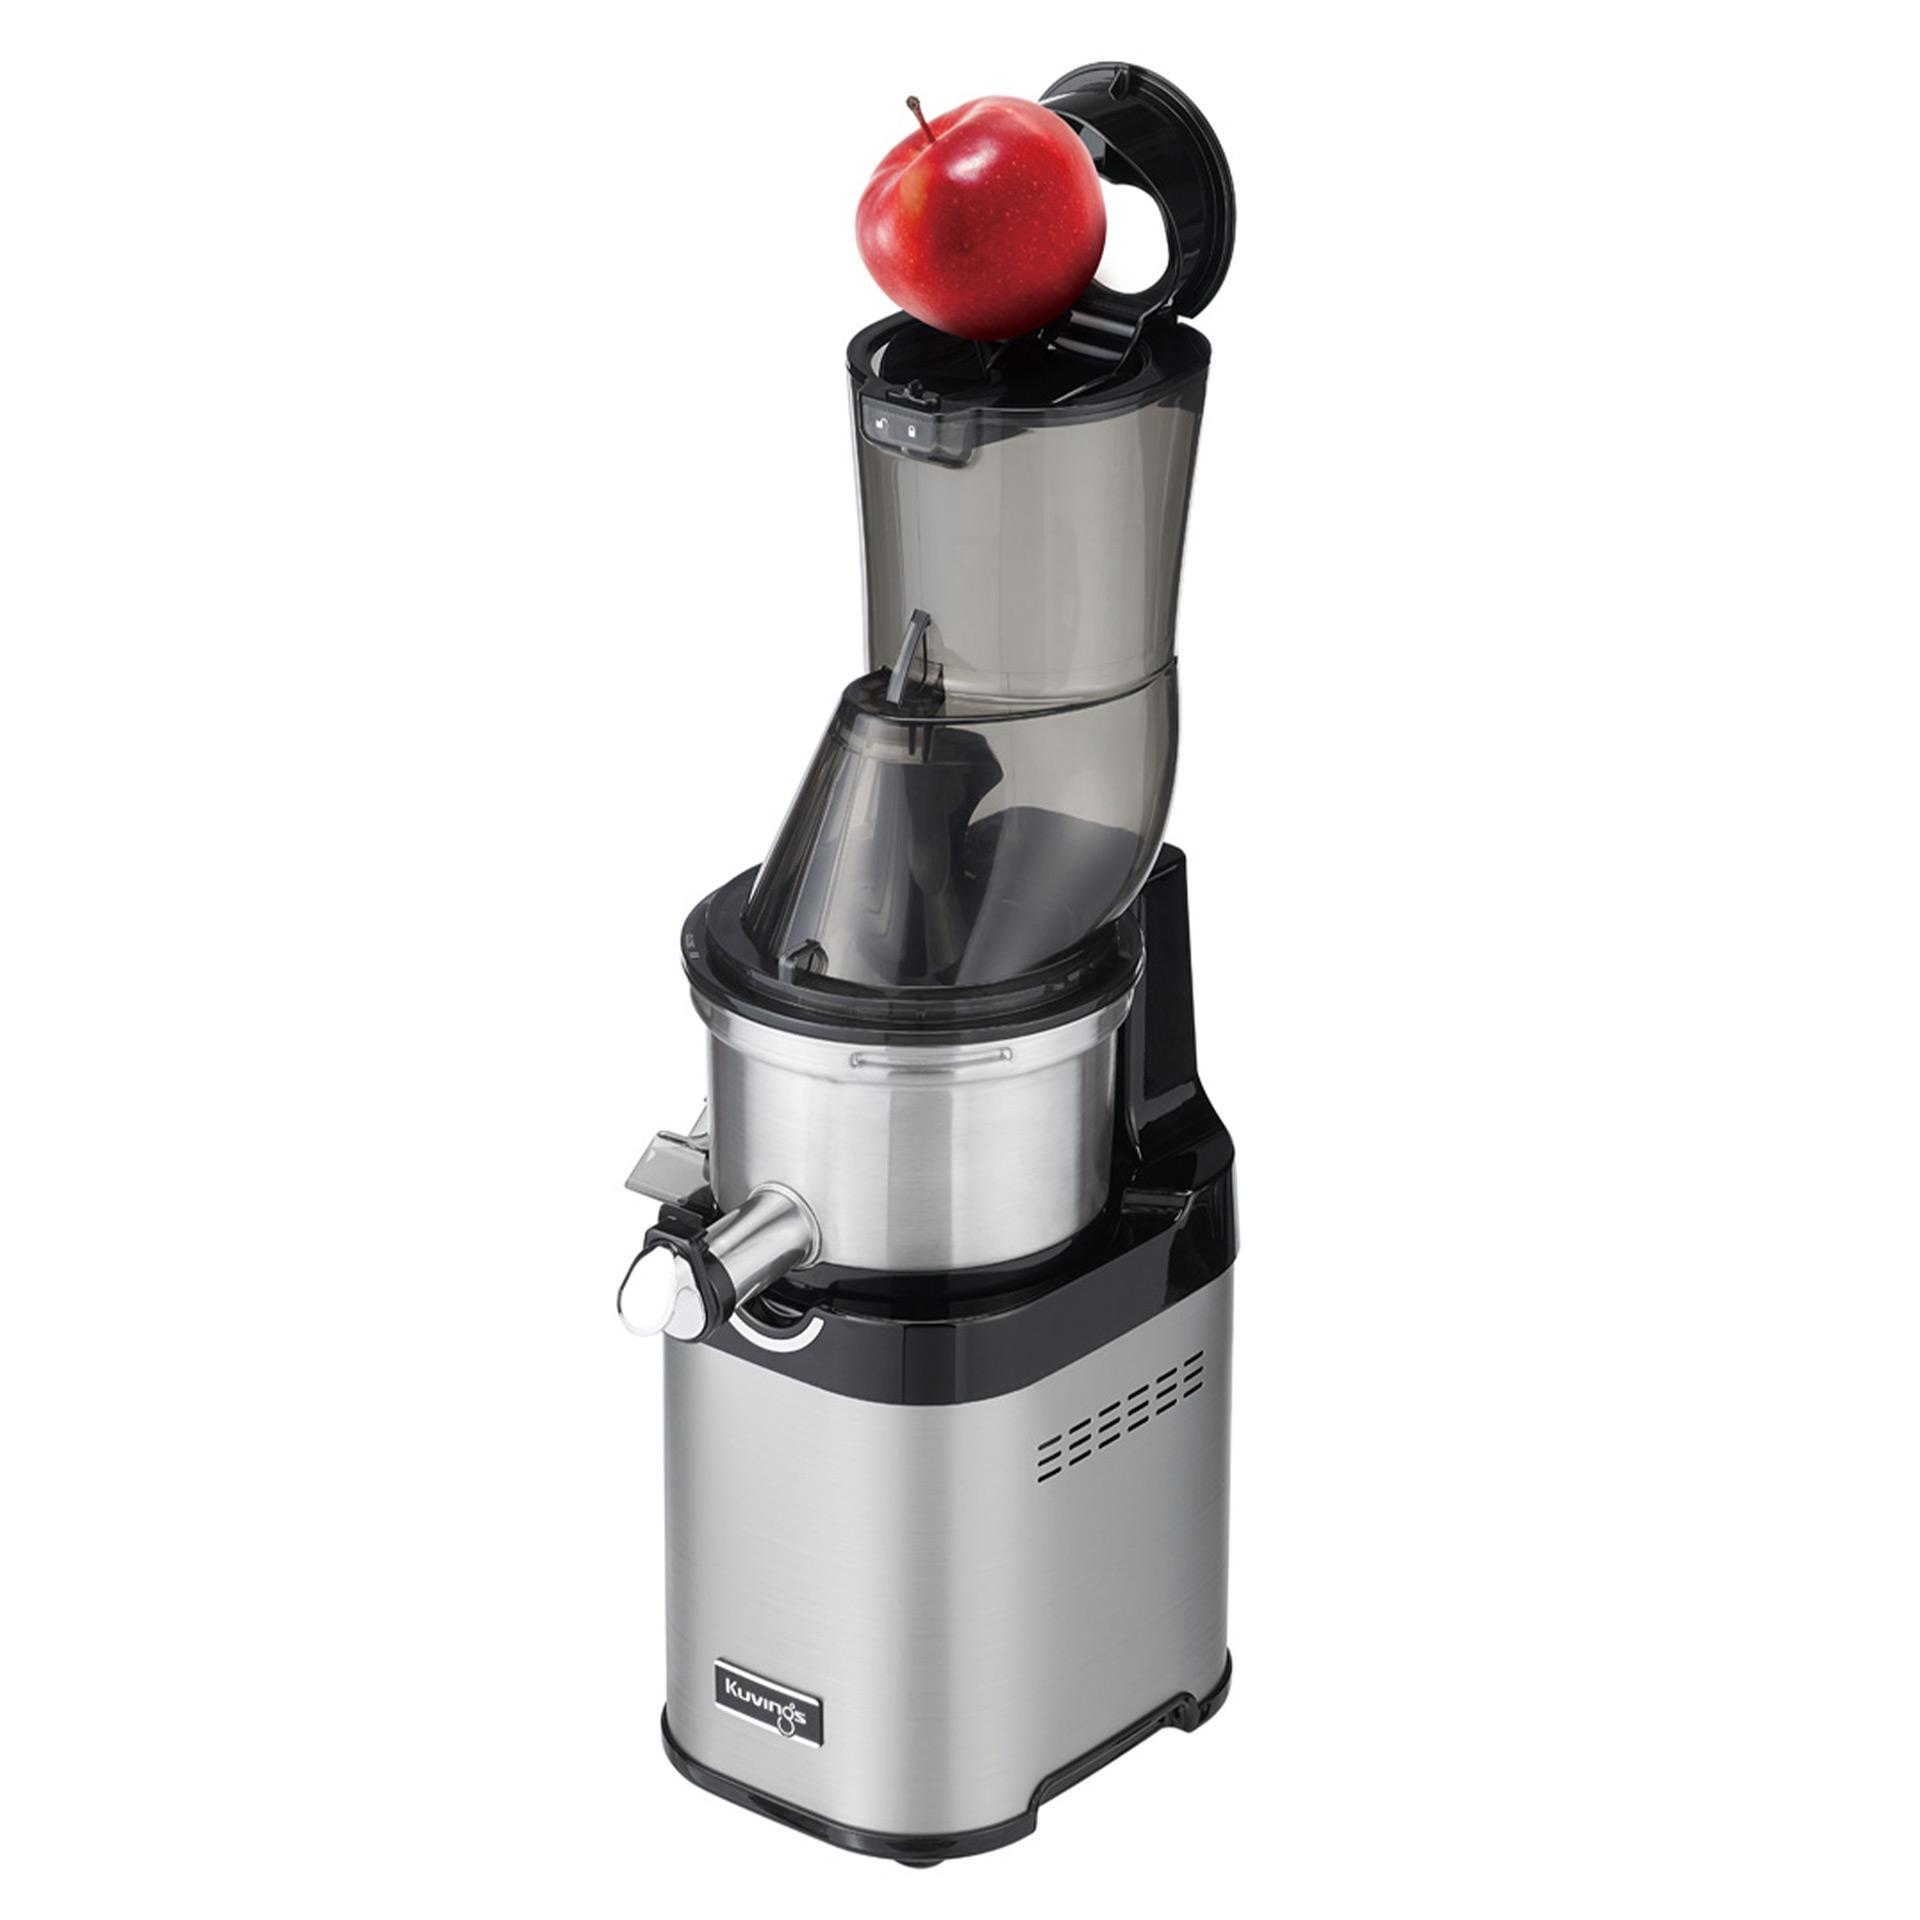 Kuvings CS700 Entsafter: Der breite Einfülltrichter ist mit ganzen Äpfeln befüllbar